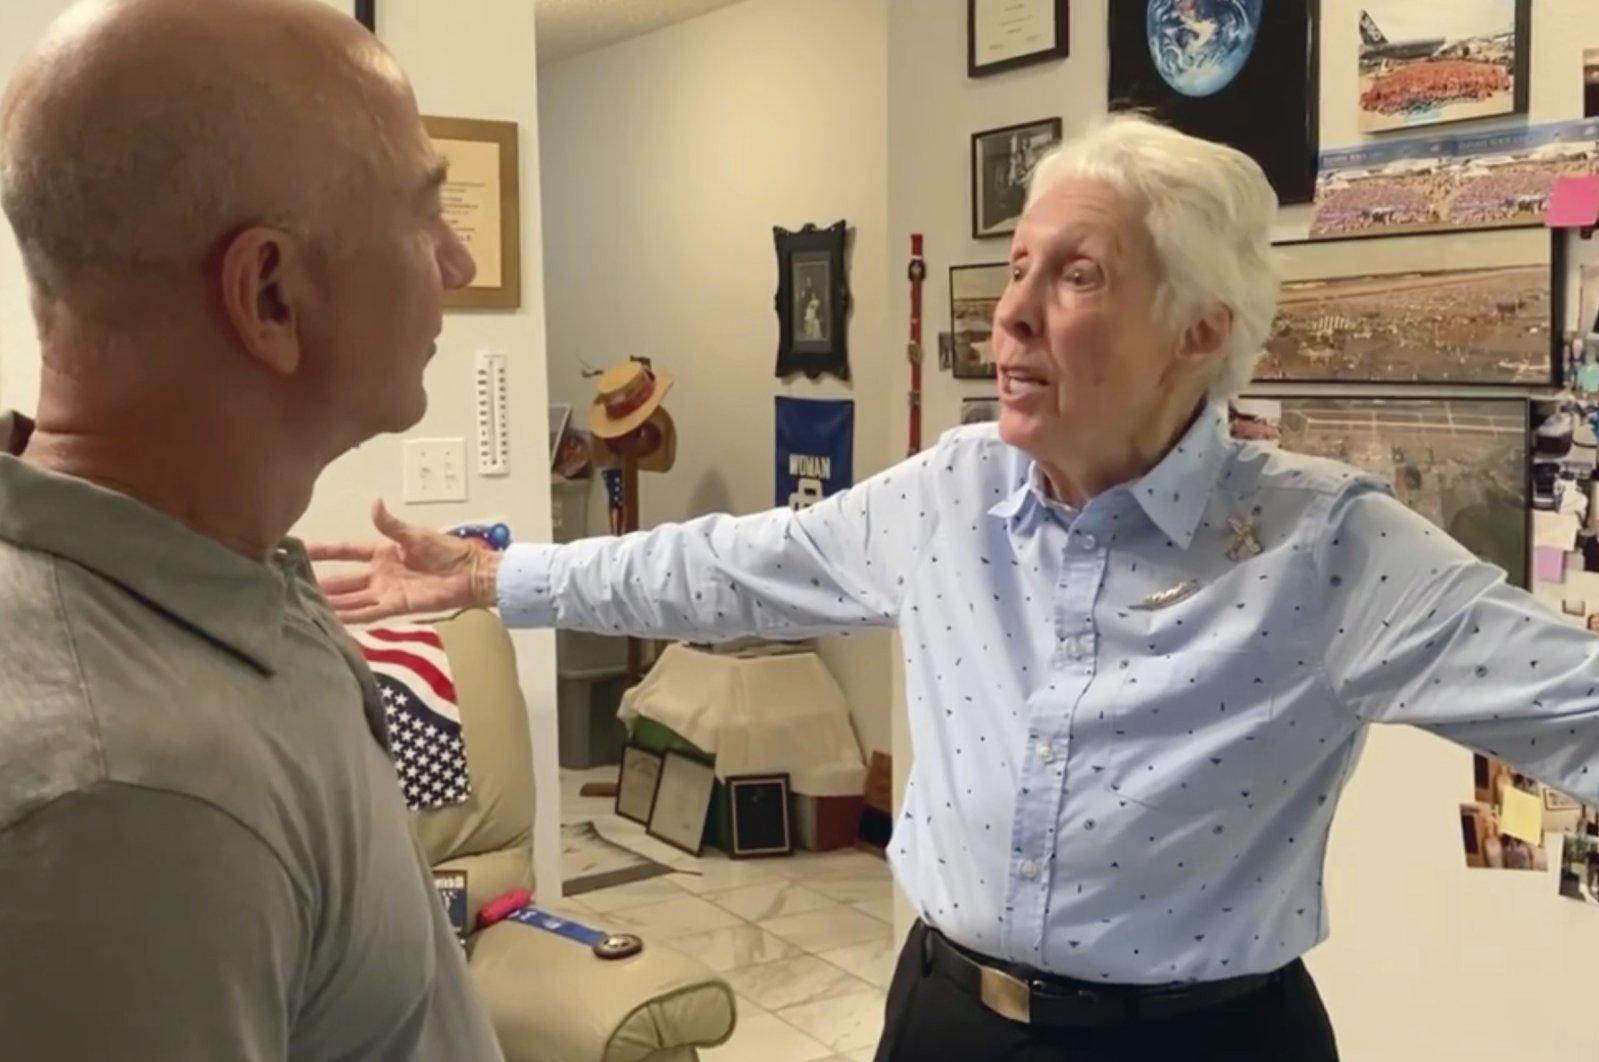 Mercury 13 astronaut trainee Wally Funk (R), meets with Jeff Bezos. (Blue Origin via AP)